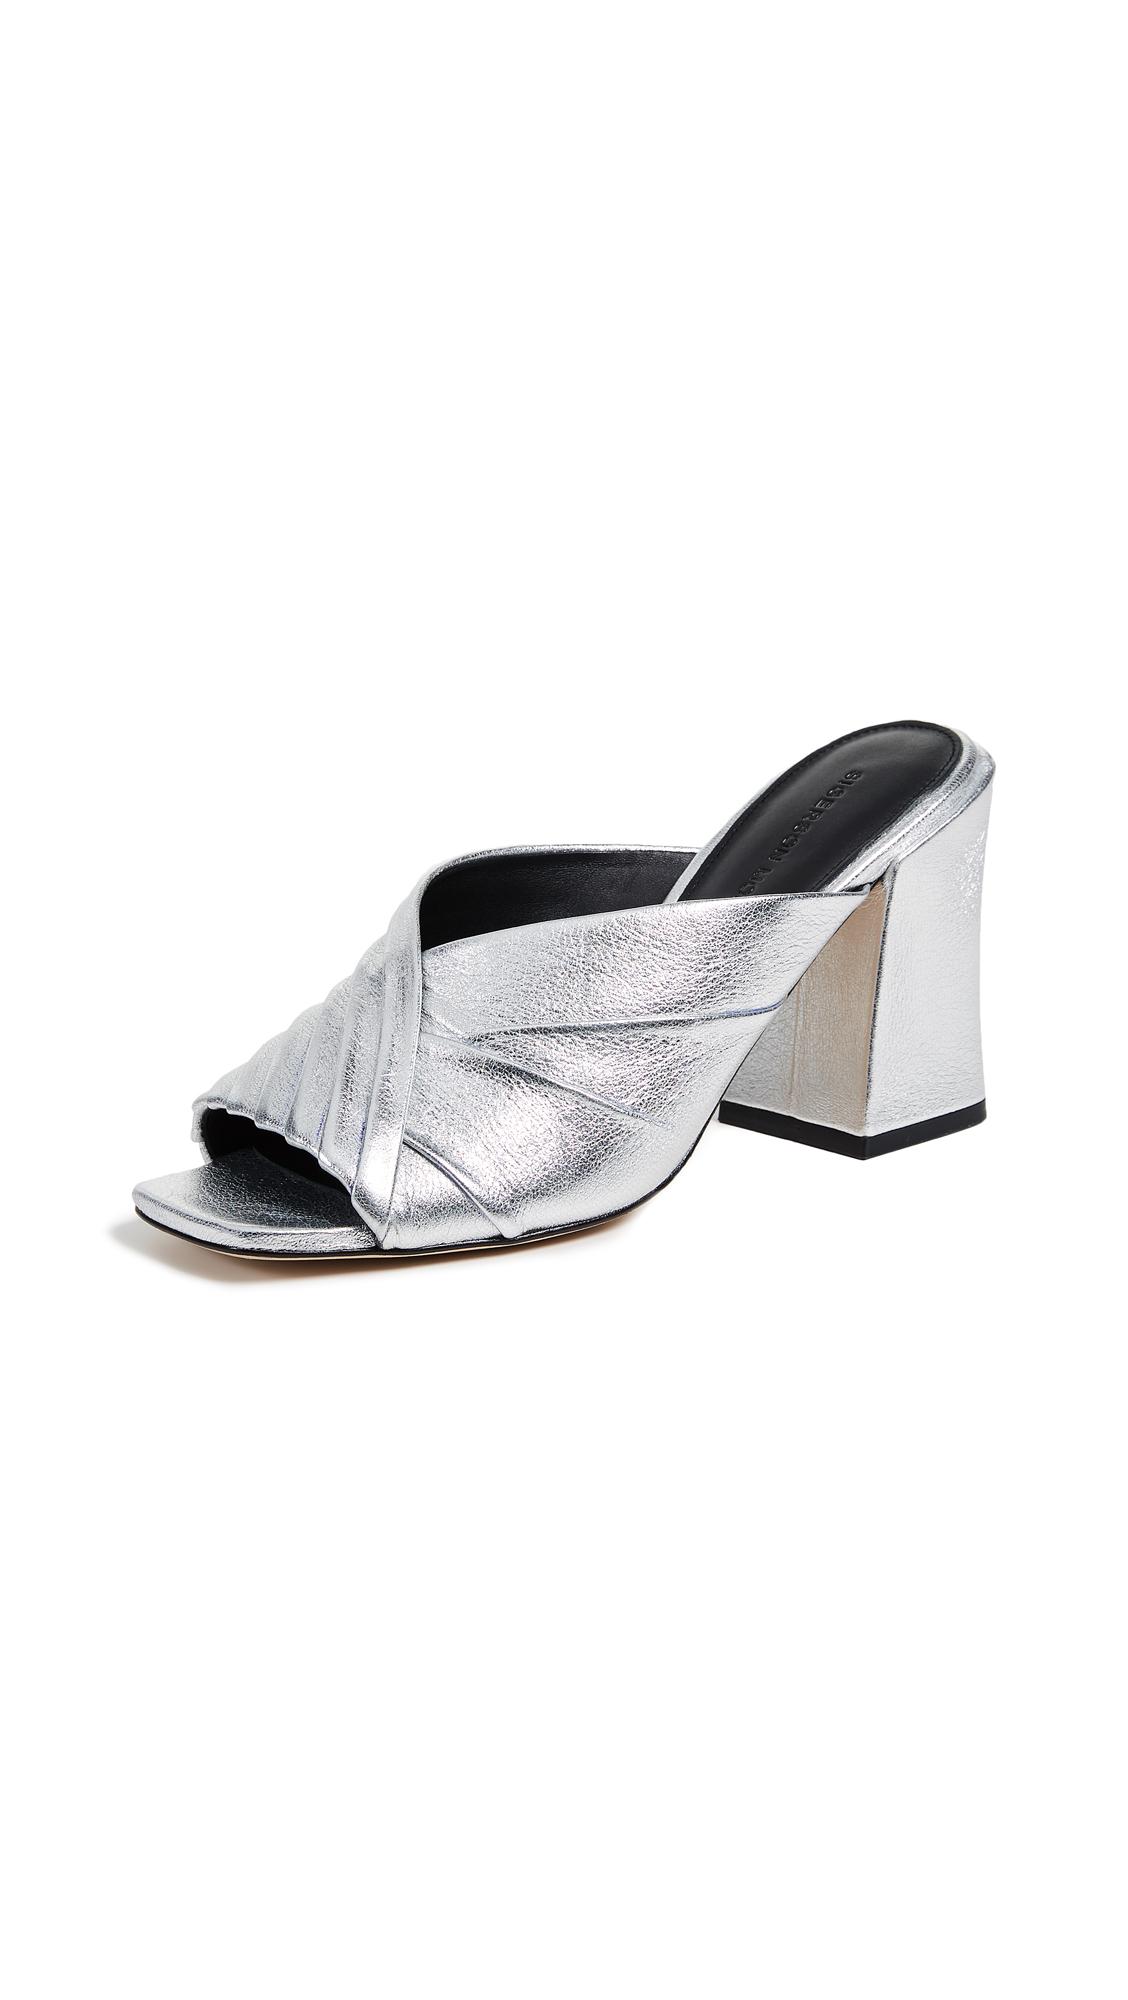 Sigerson Morrison Pramod Block Heel Sandals - Silver